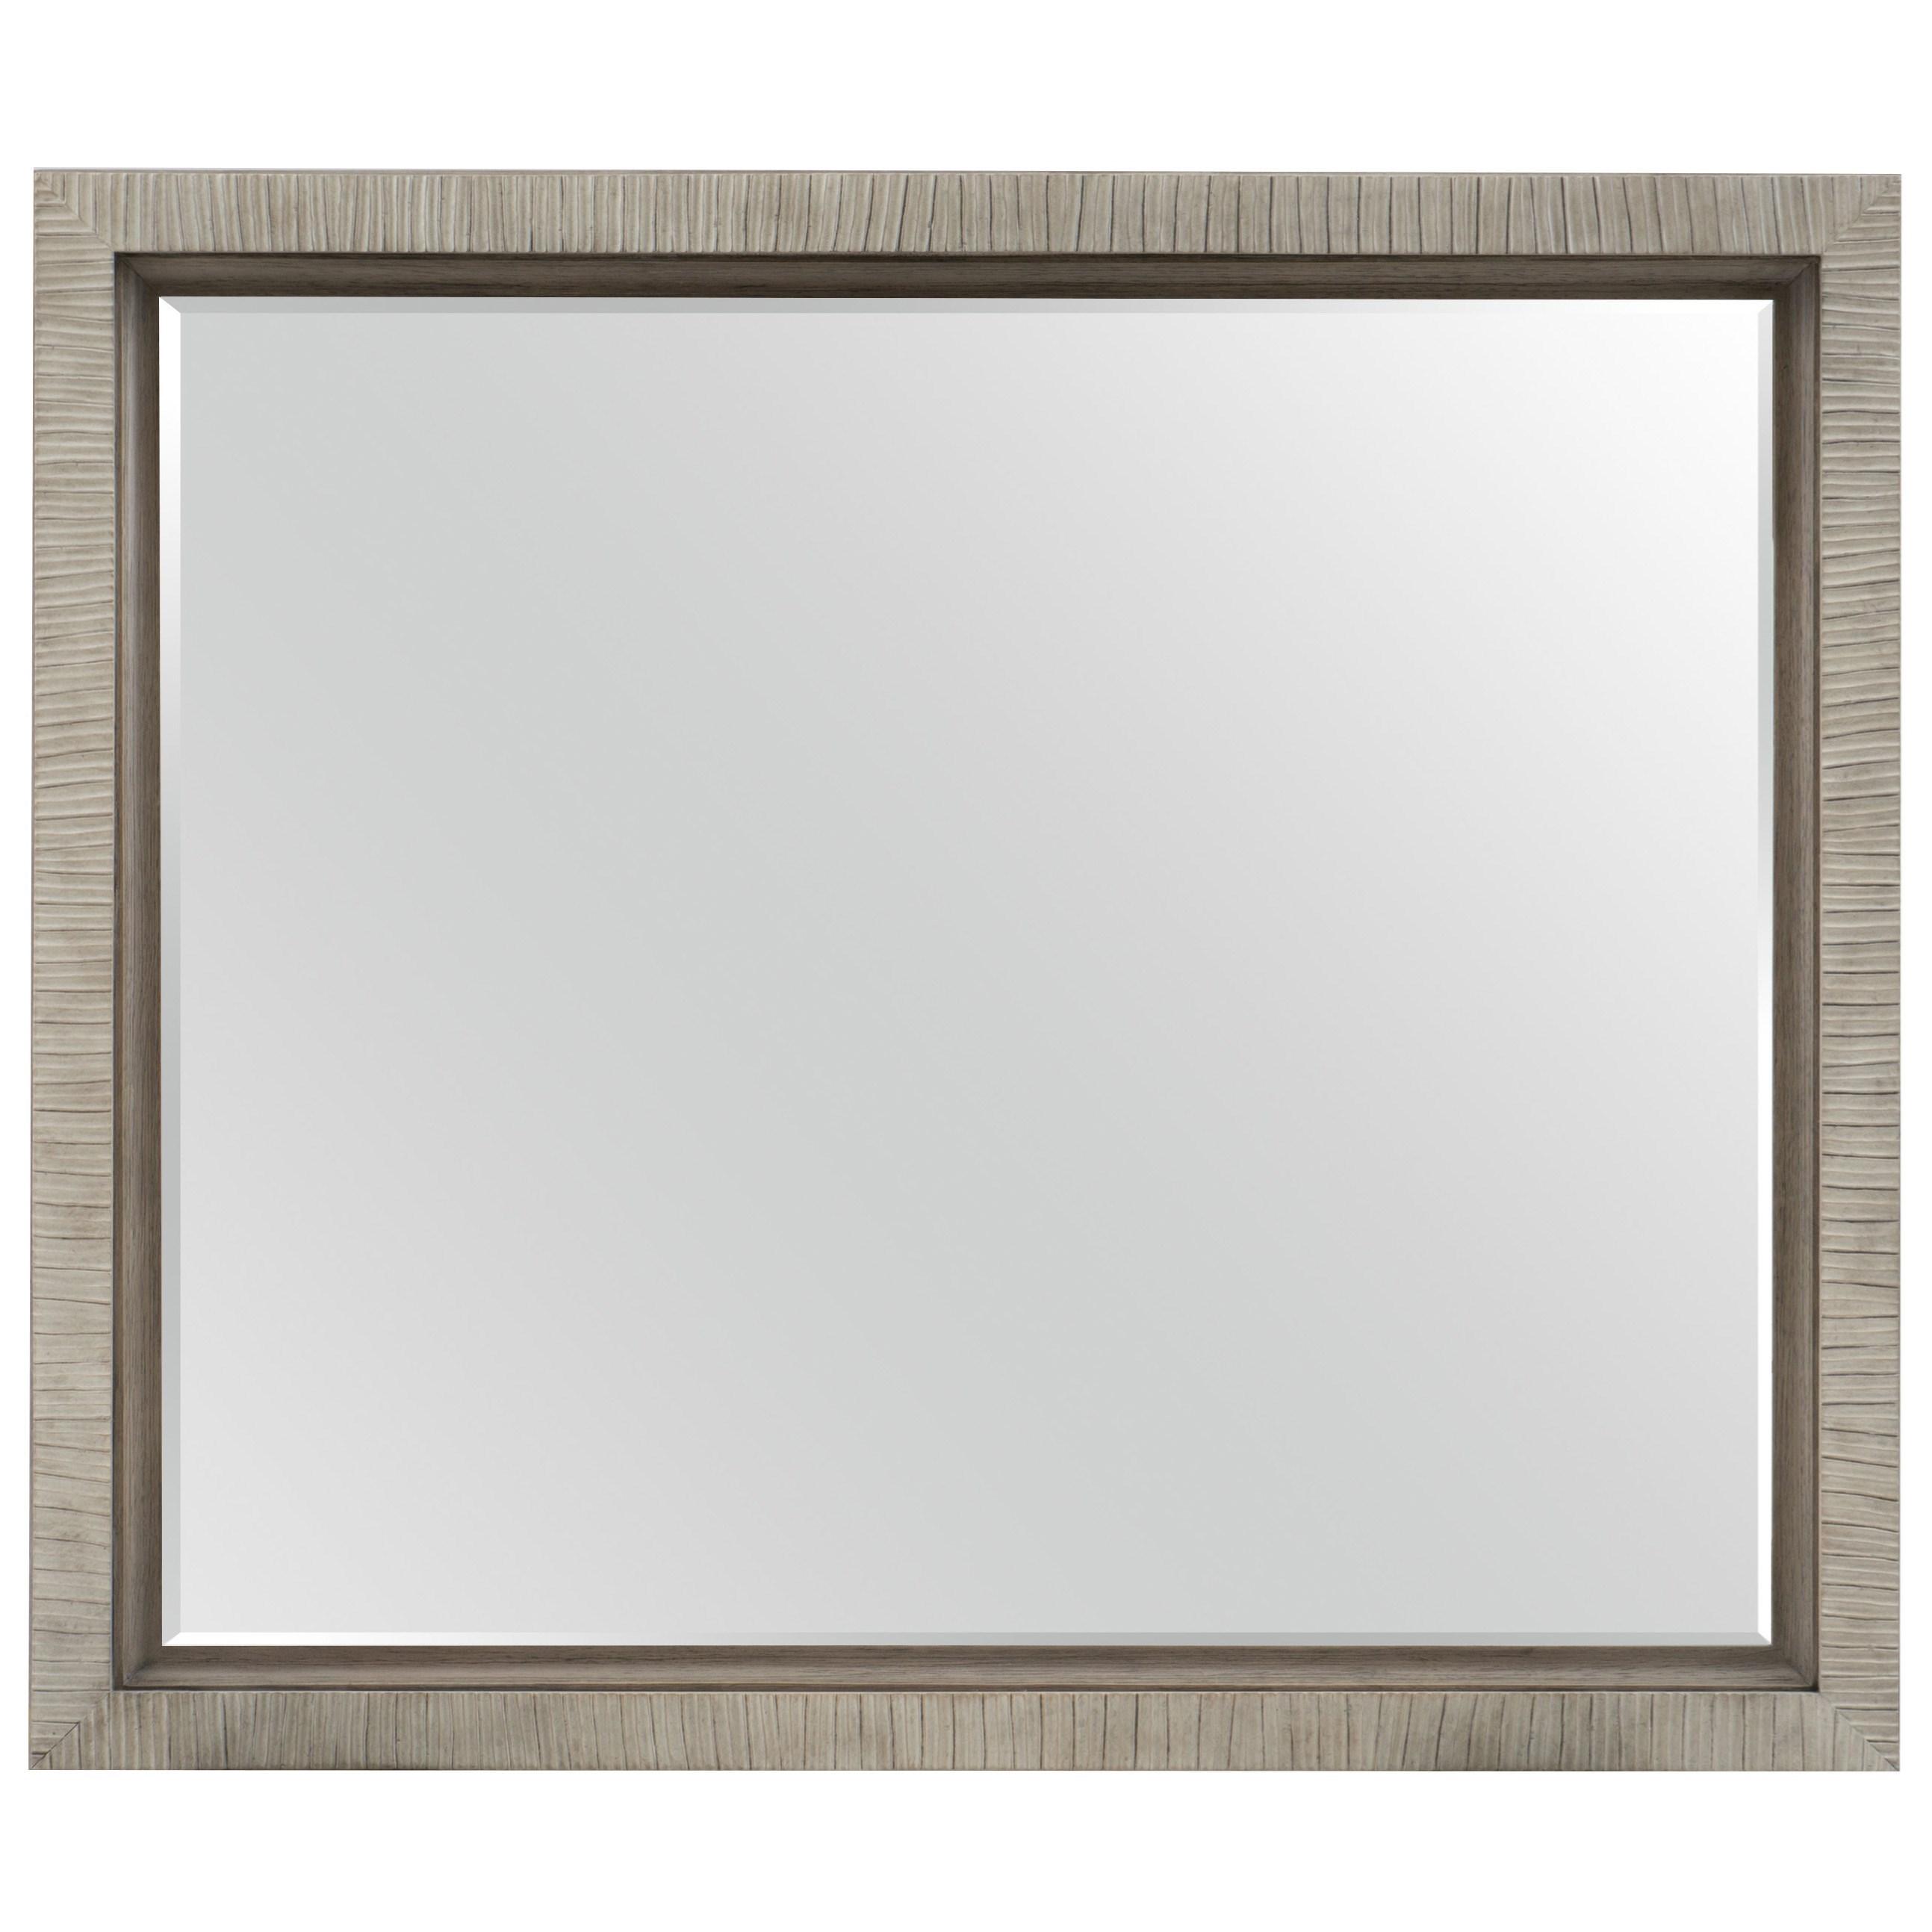 Elixir Mirror by Hooker Furniture at Alison Craig Home Furnishings